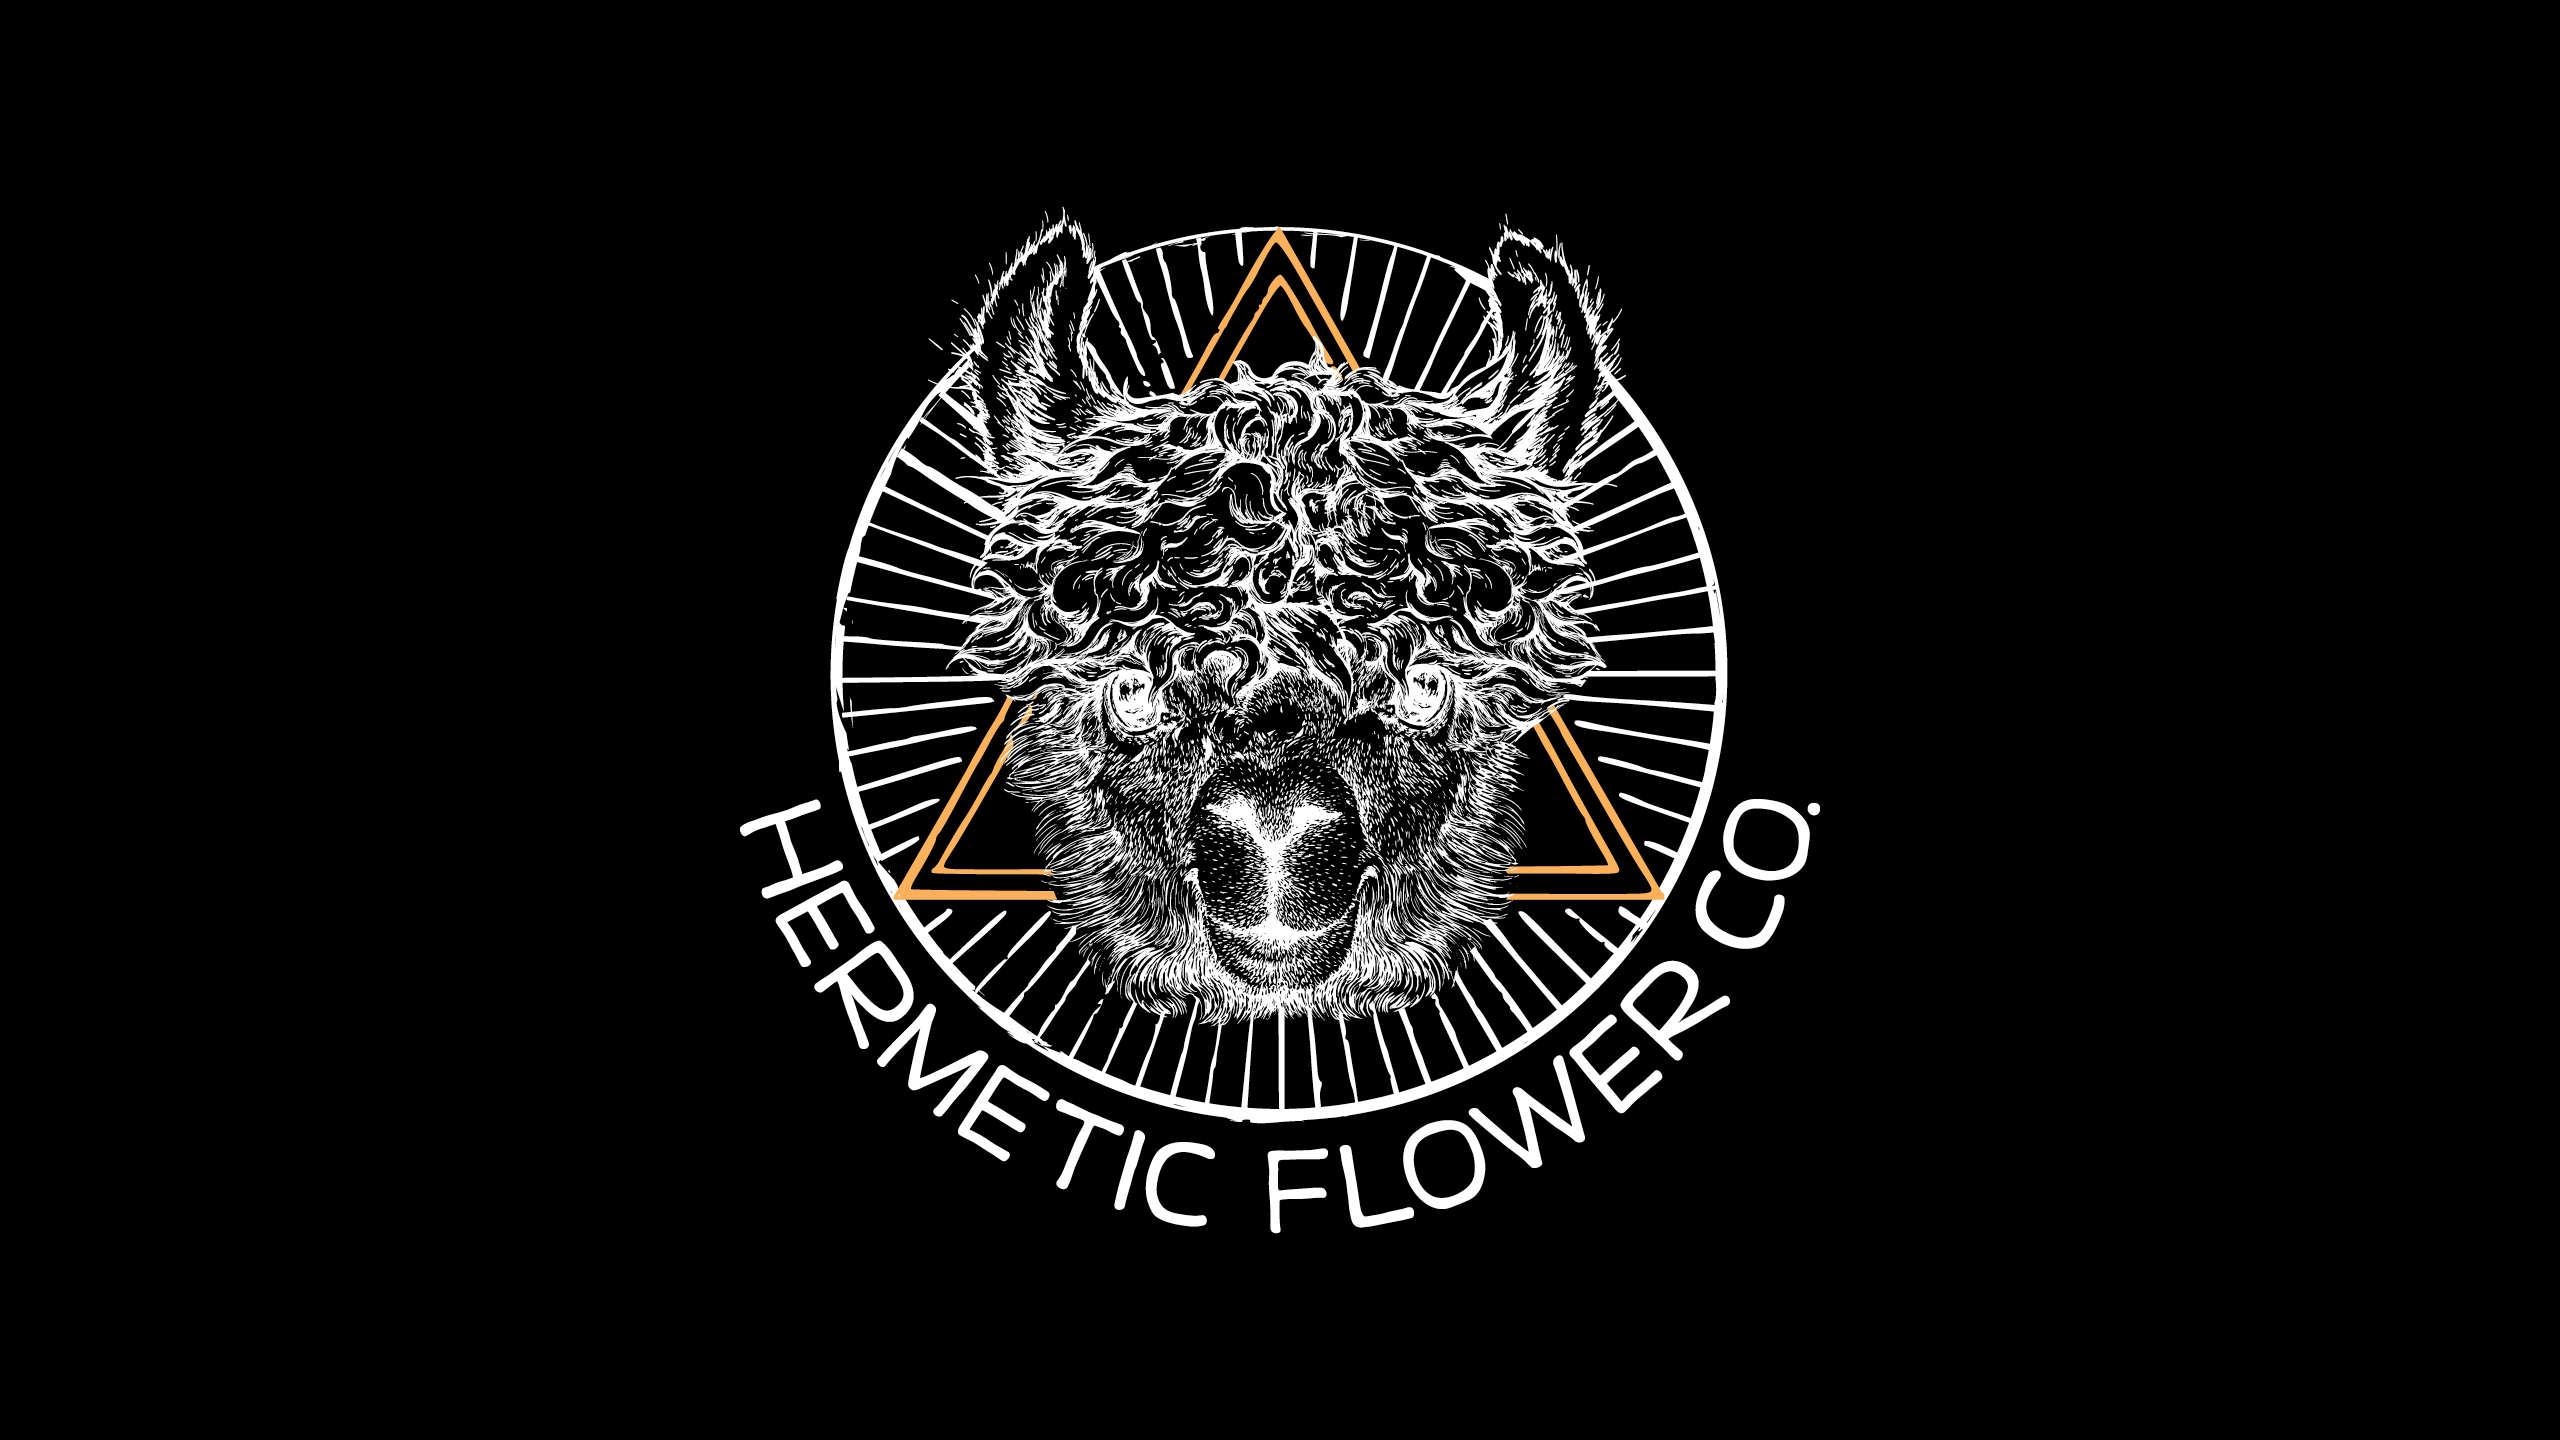 Hermetic Flower Company Logo Creation by High Road Design Studio